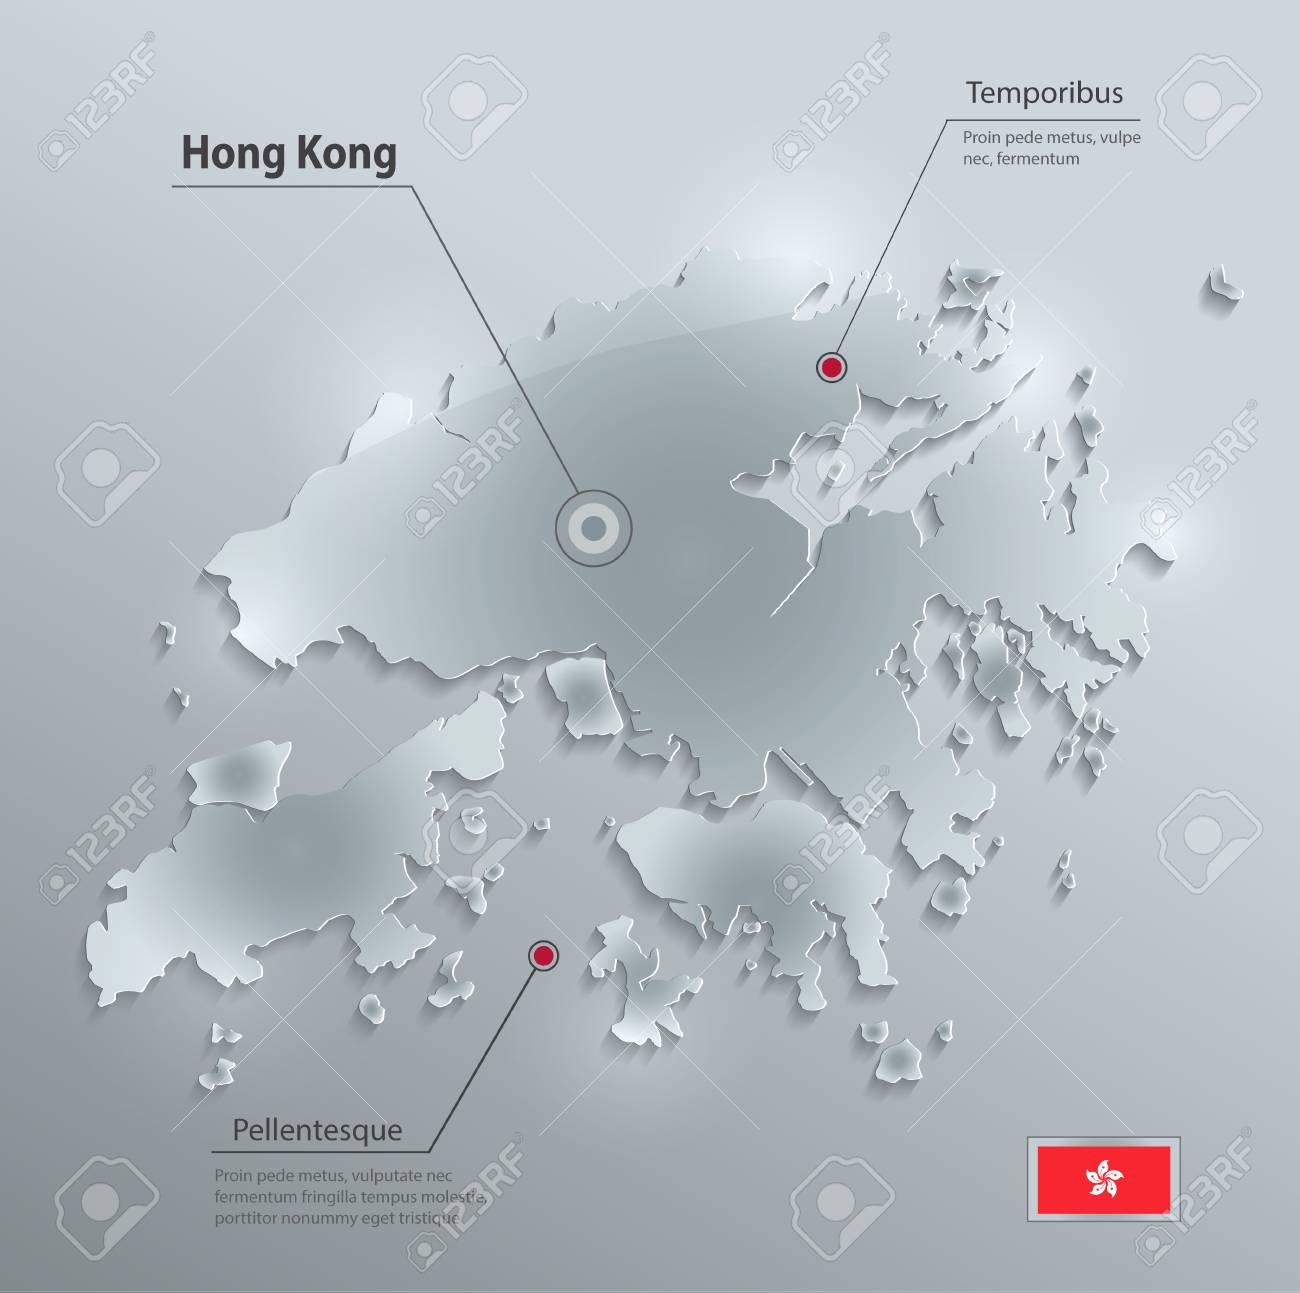 Hong Kong map - 98031551